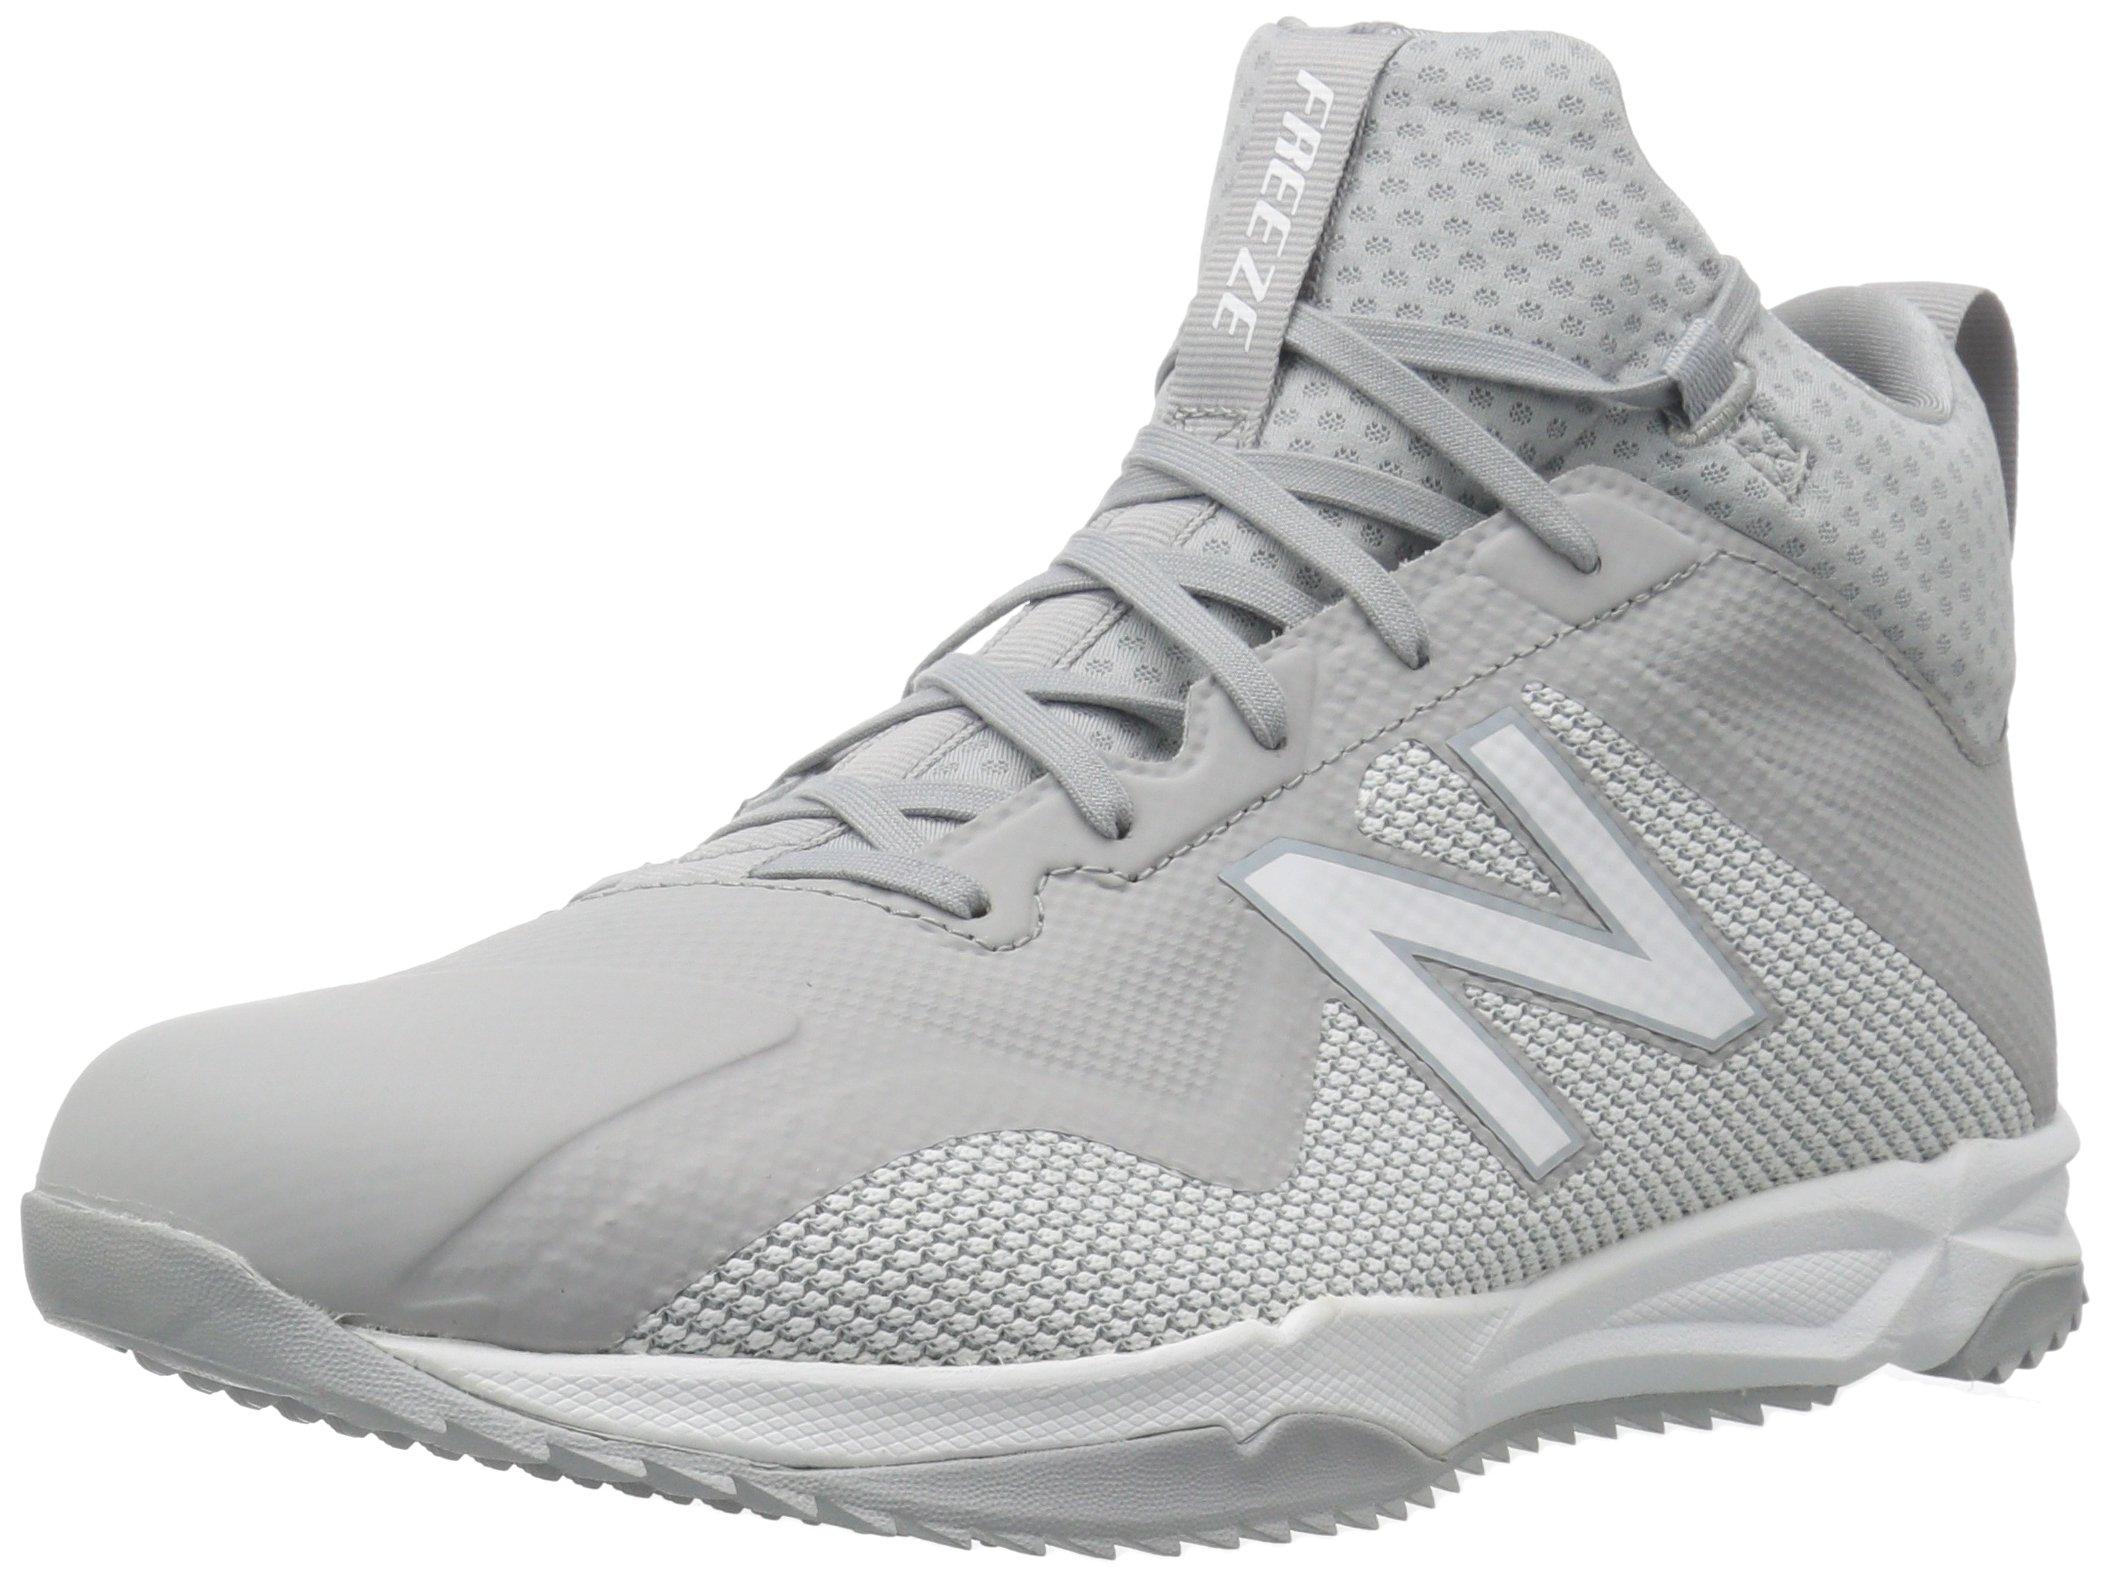 New Balance Men's Freeze v1 Turf Agility Lacrosse Shoe, Grey/White, 7 D US by New Balance